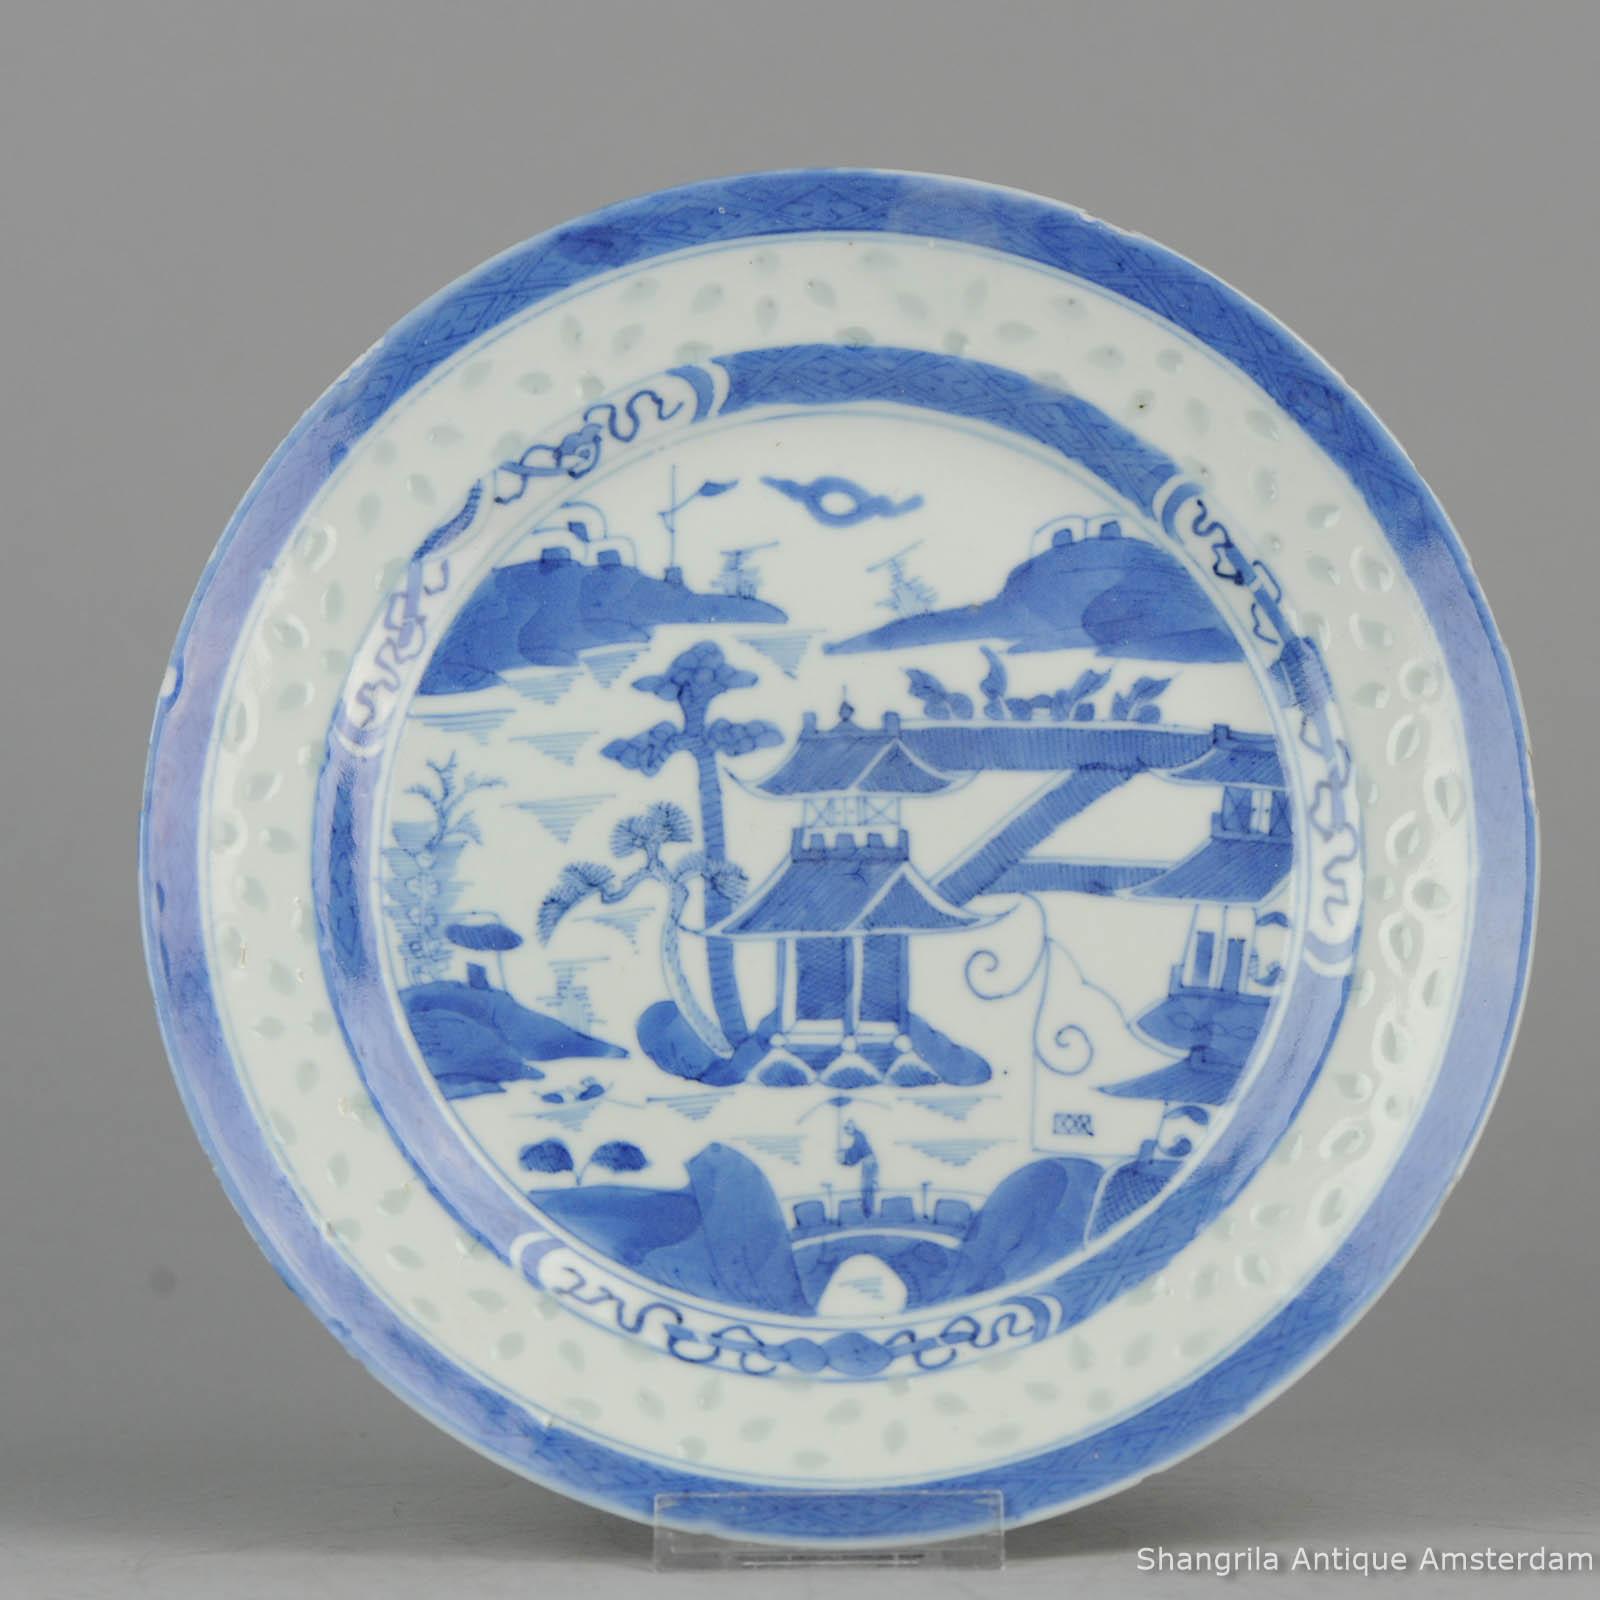 Antique Porcelain Plate Rice Blue White